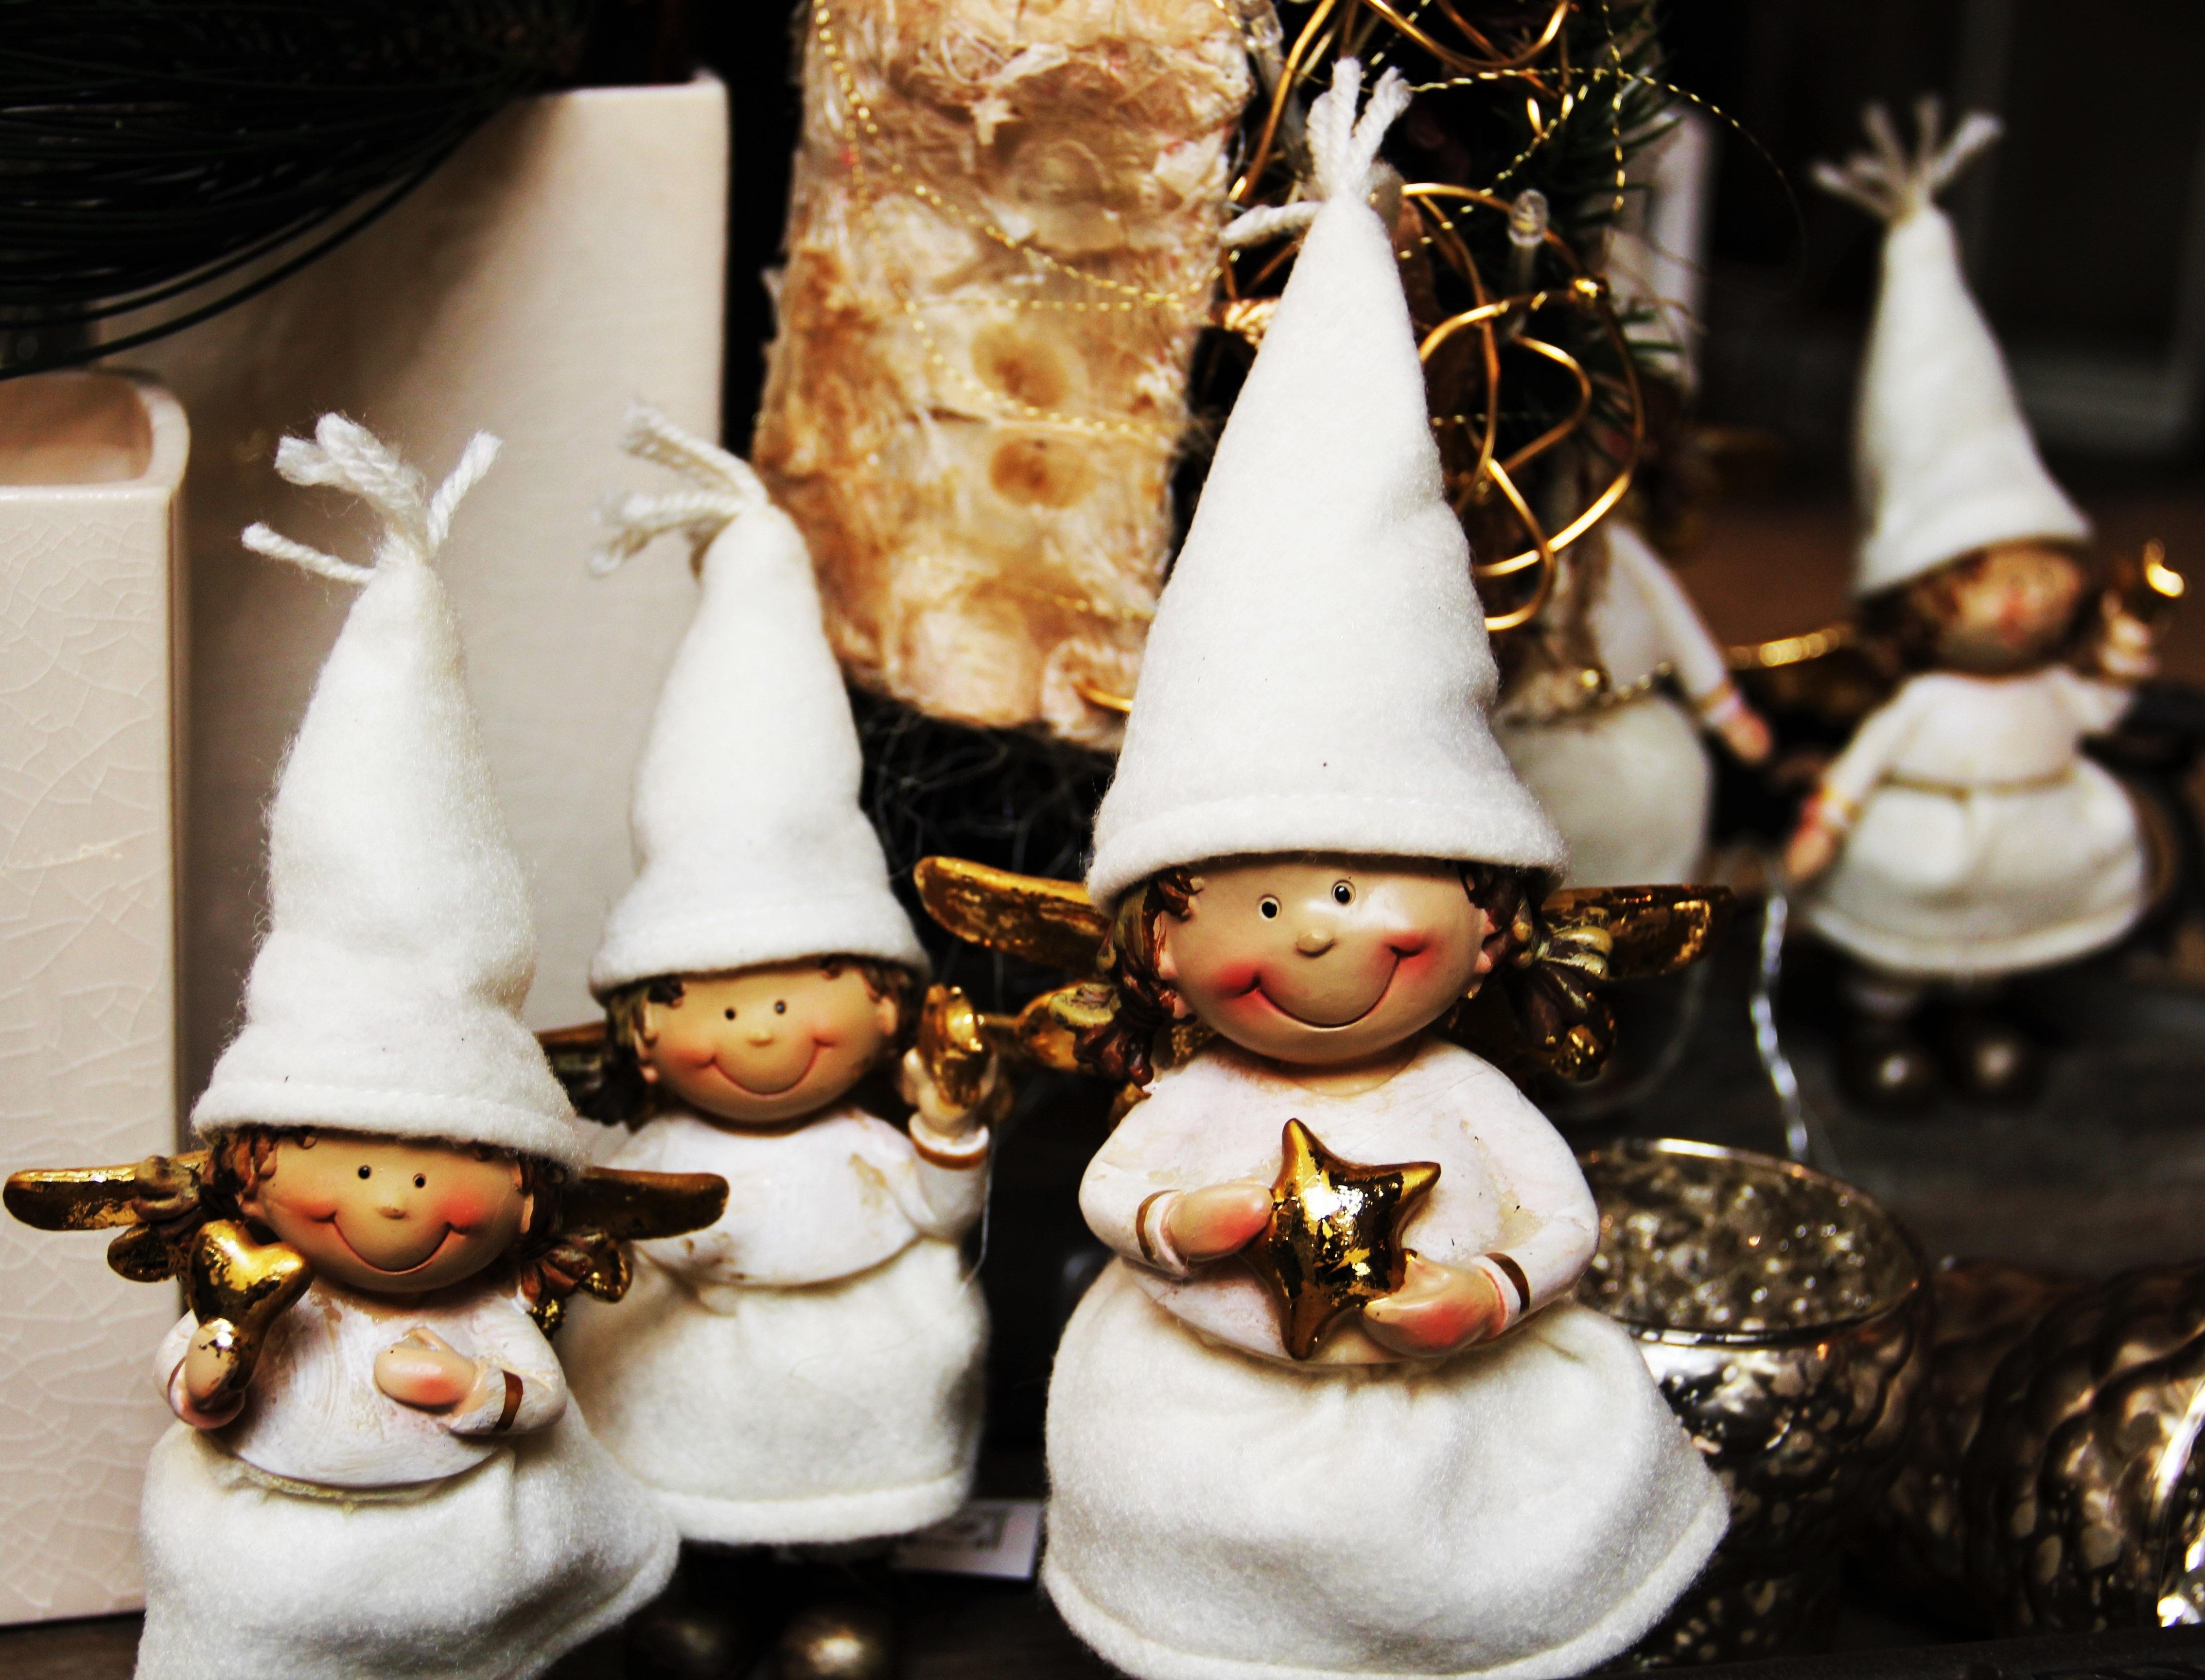 Bakgrundsbilder vit stj rna dekoration f rsta advent - Dekoration advent ...